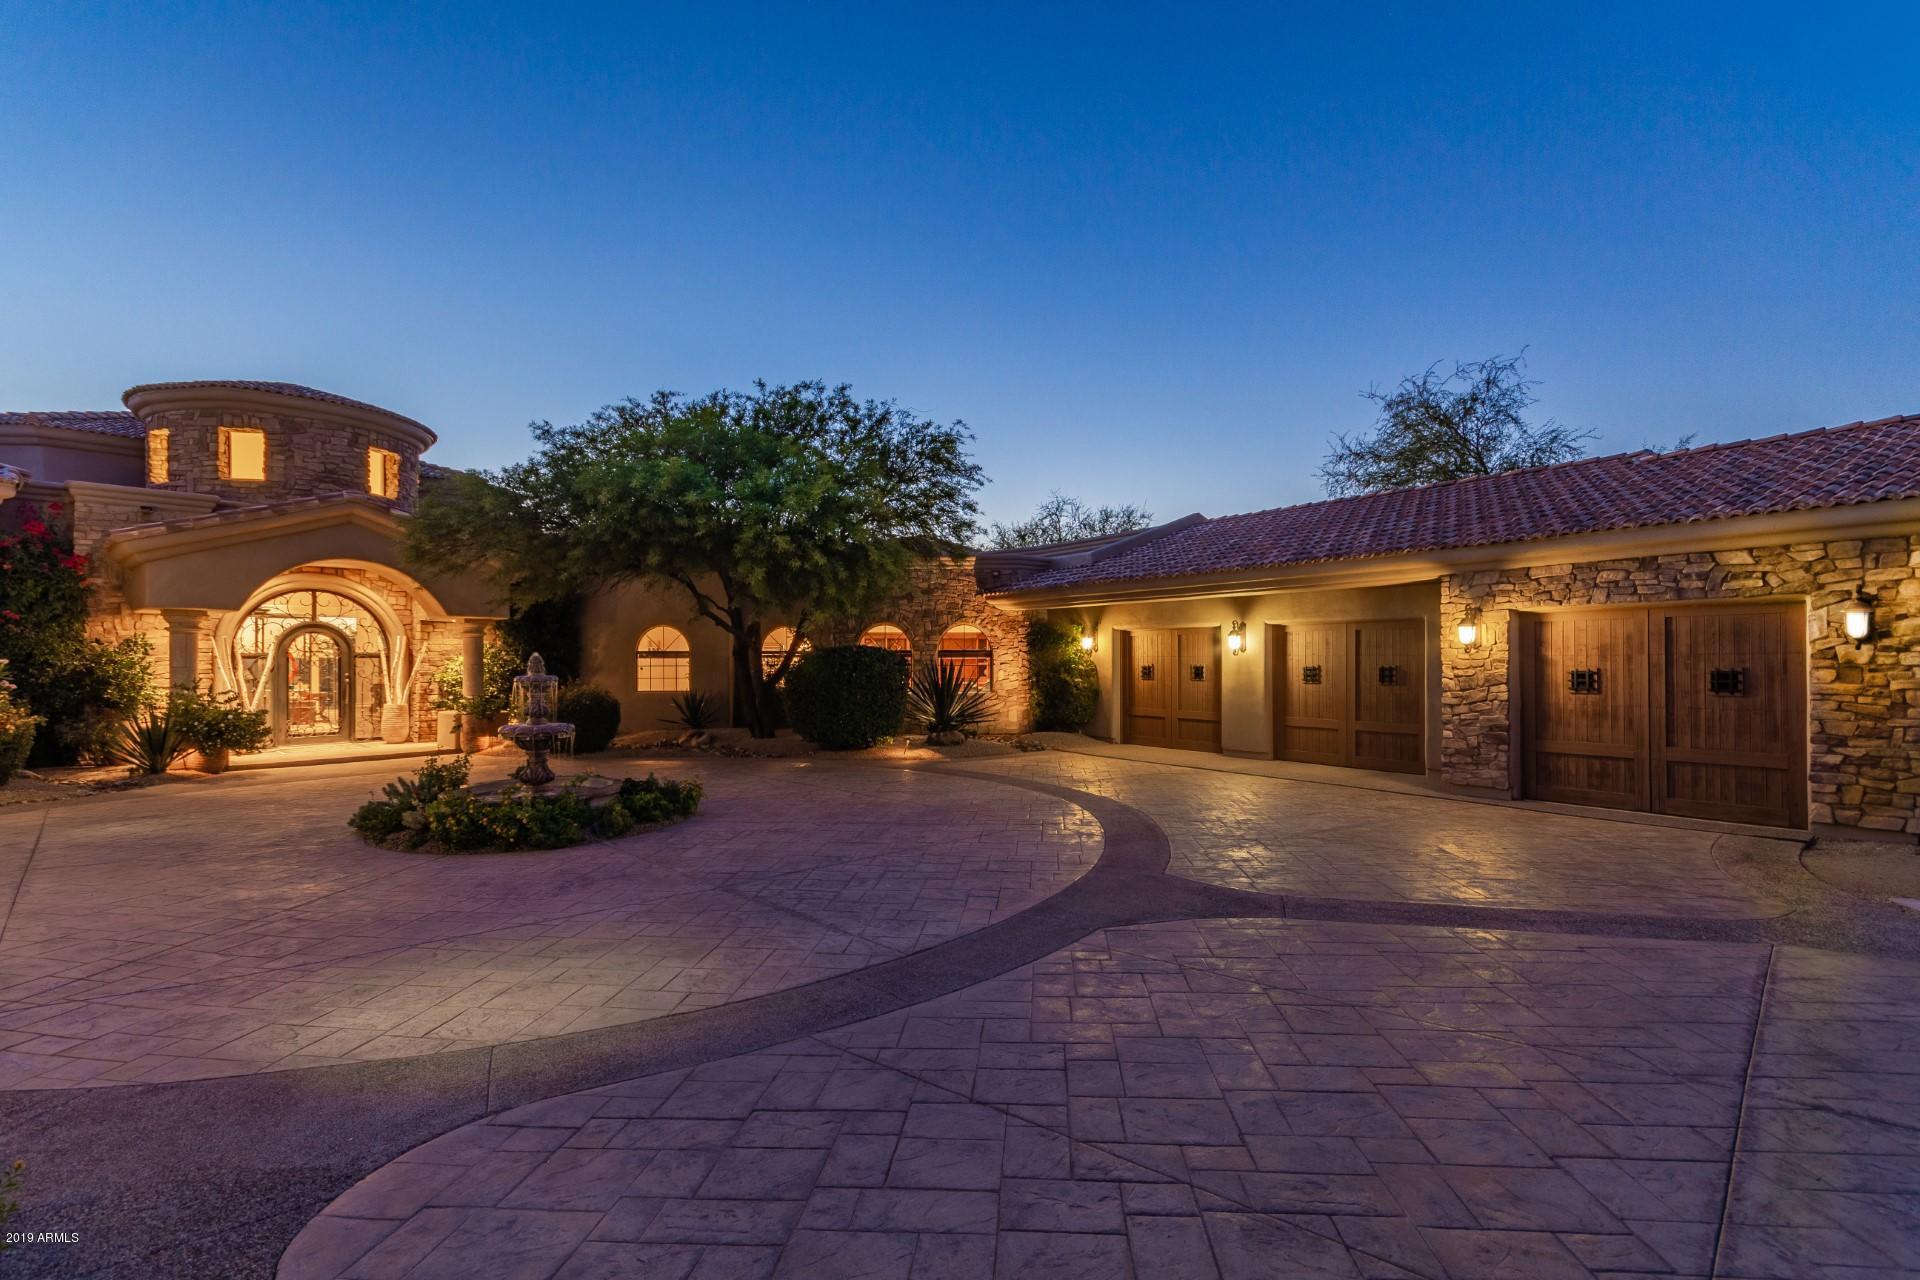 Photo of 10074 E Troon North Drive, Scottsdale, AZ 85262